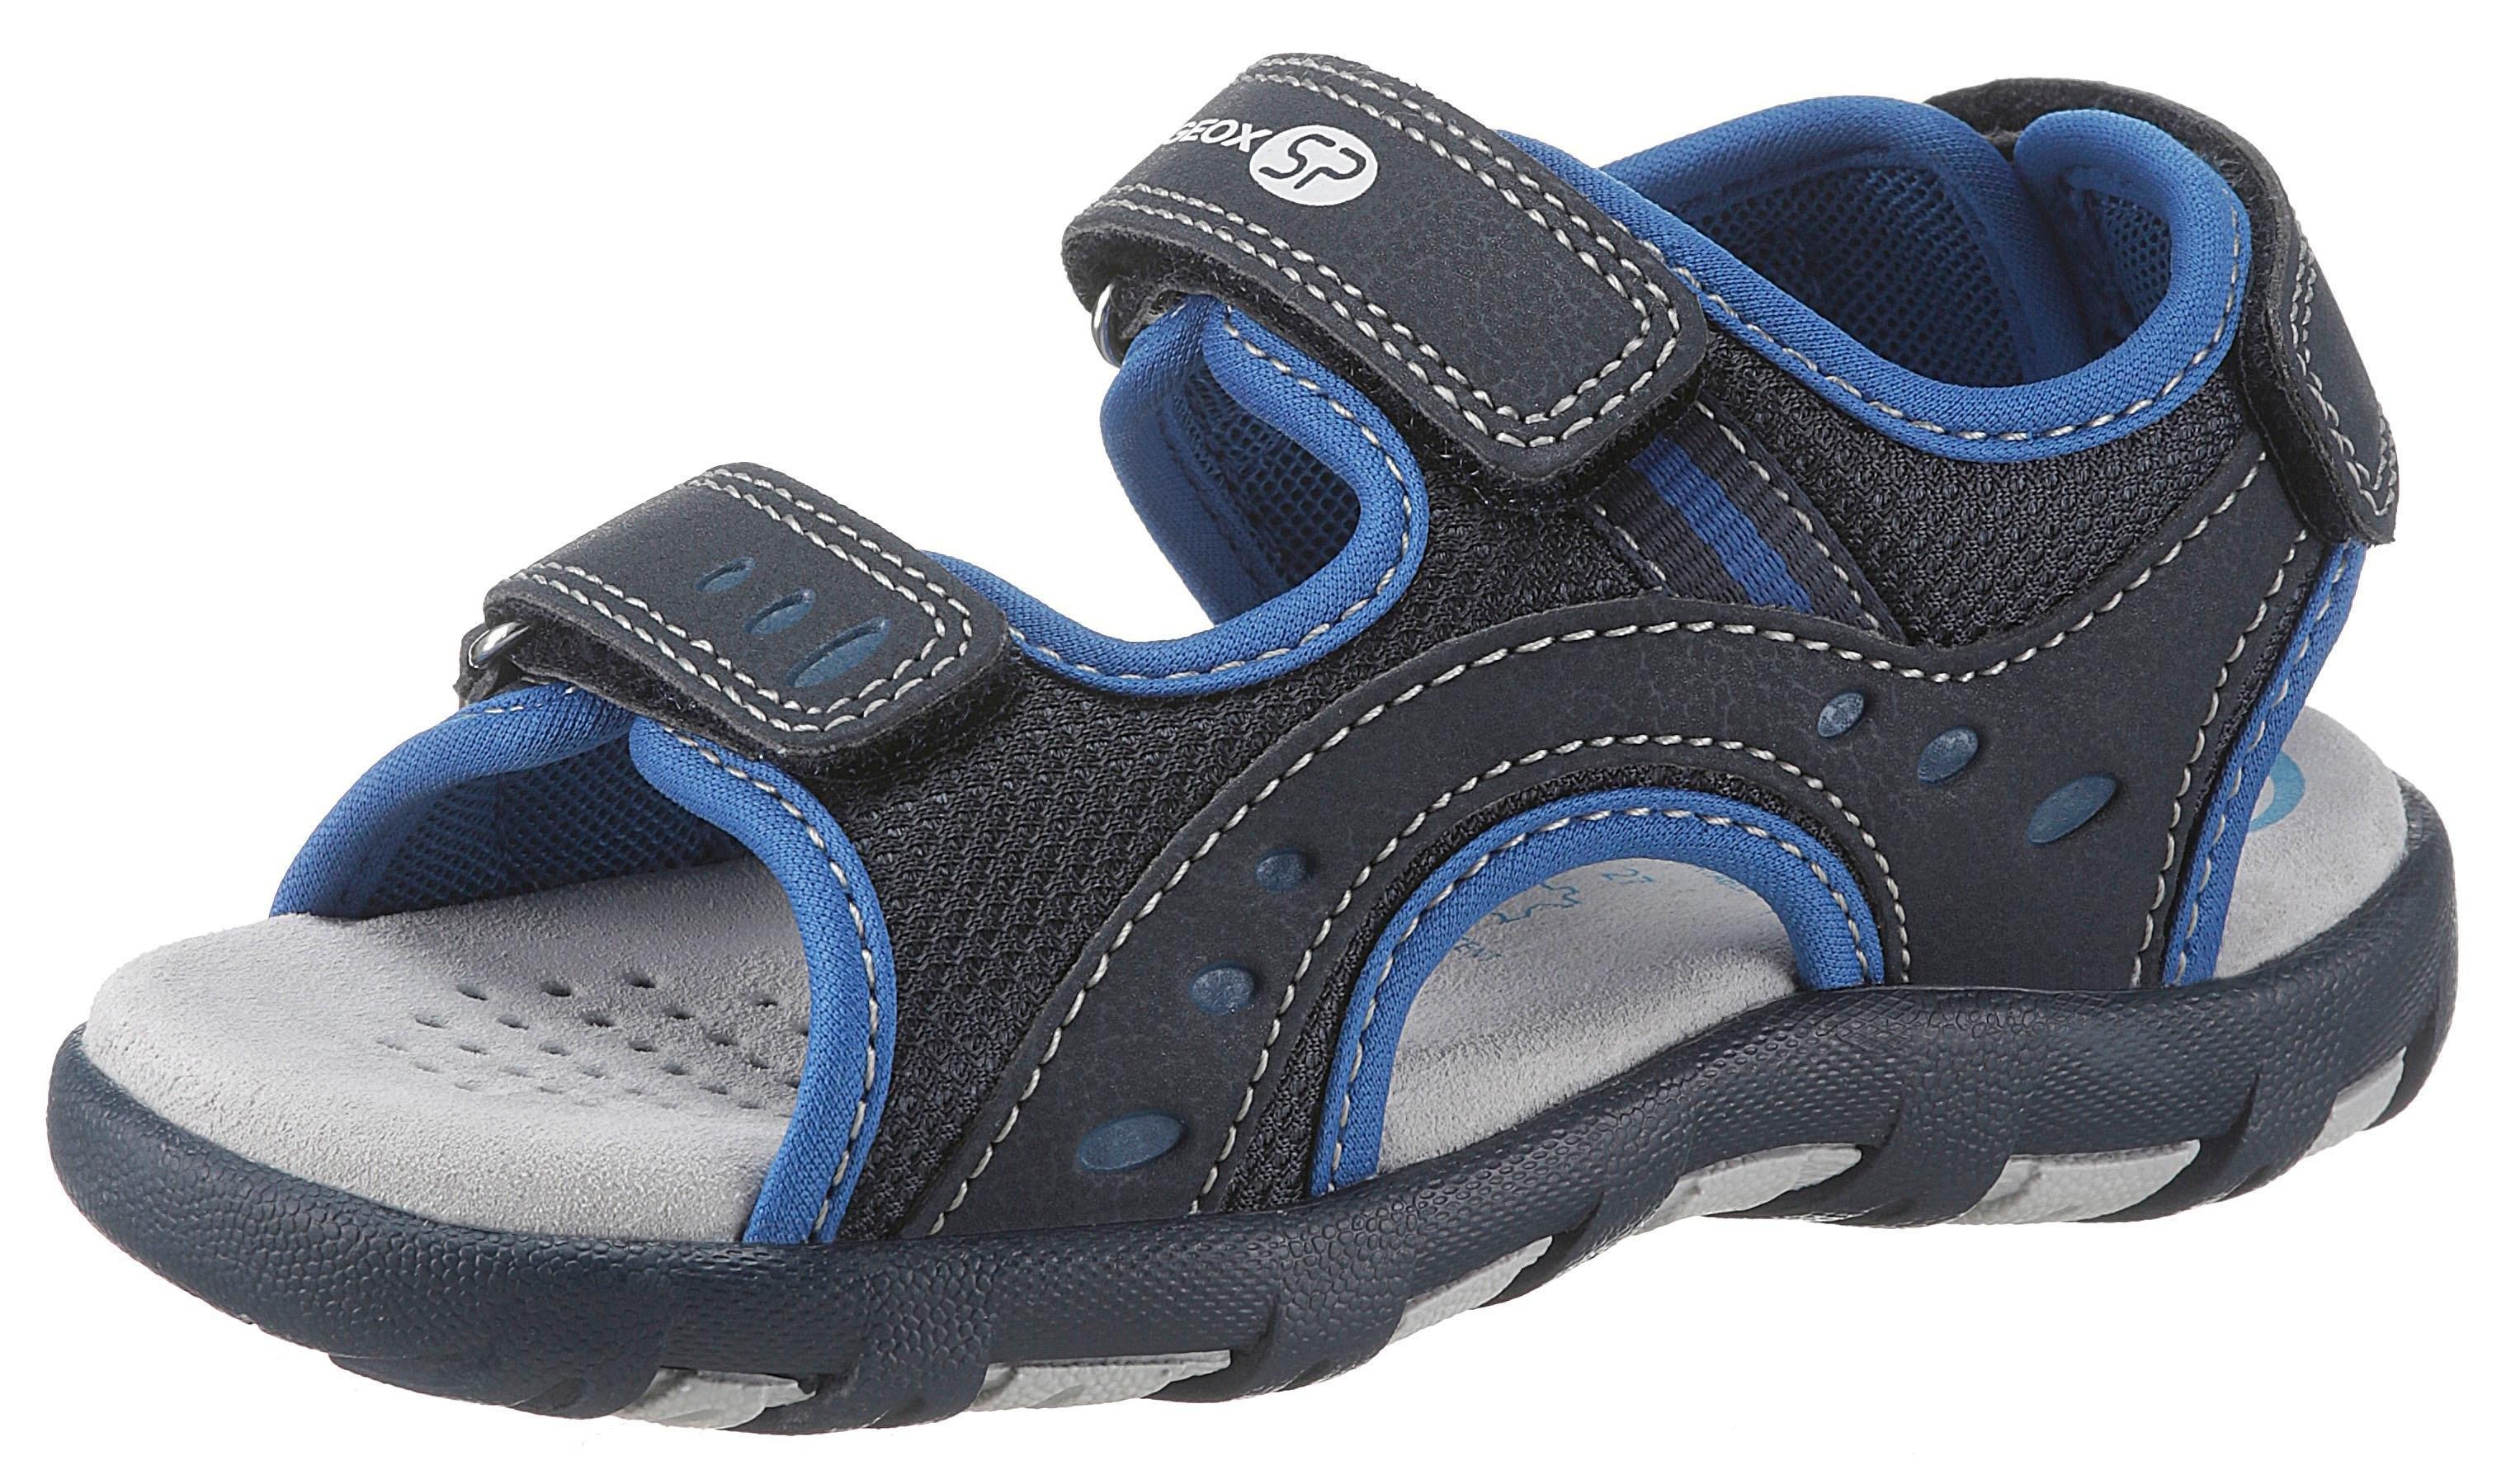 Geox Kids sandalen »Pianeta« nu online bestellen